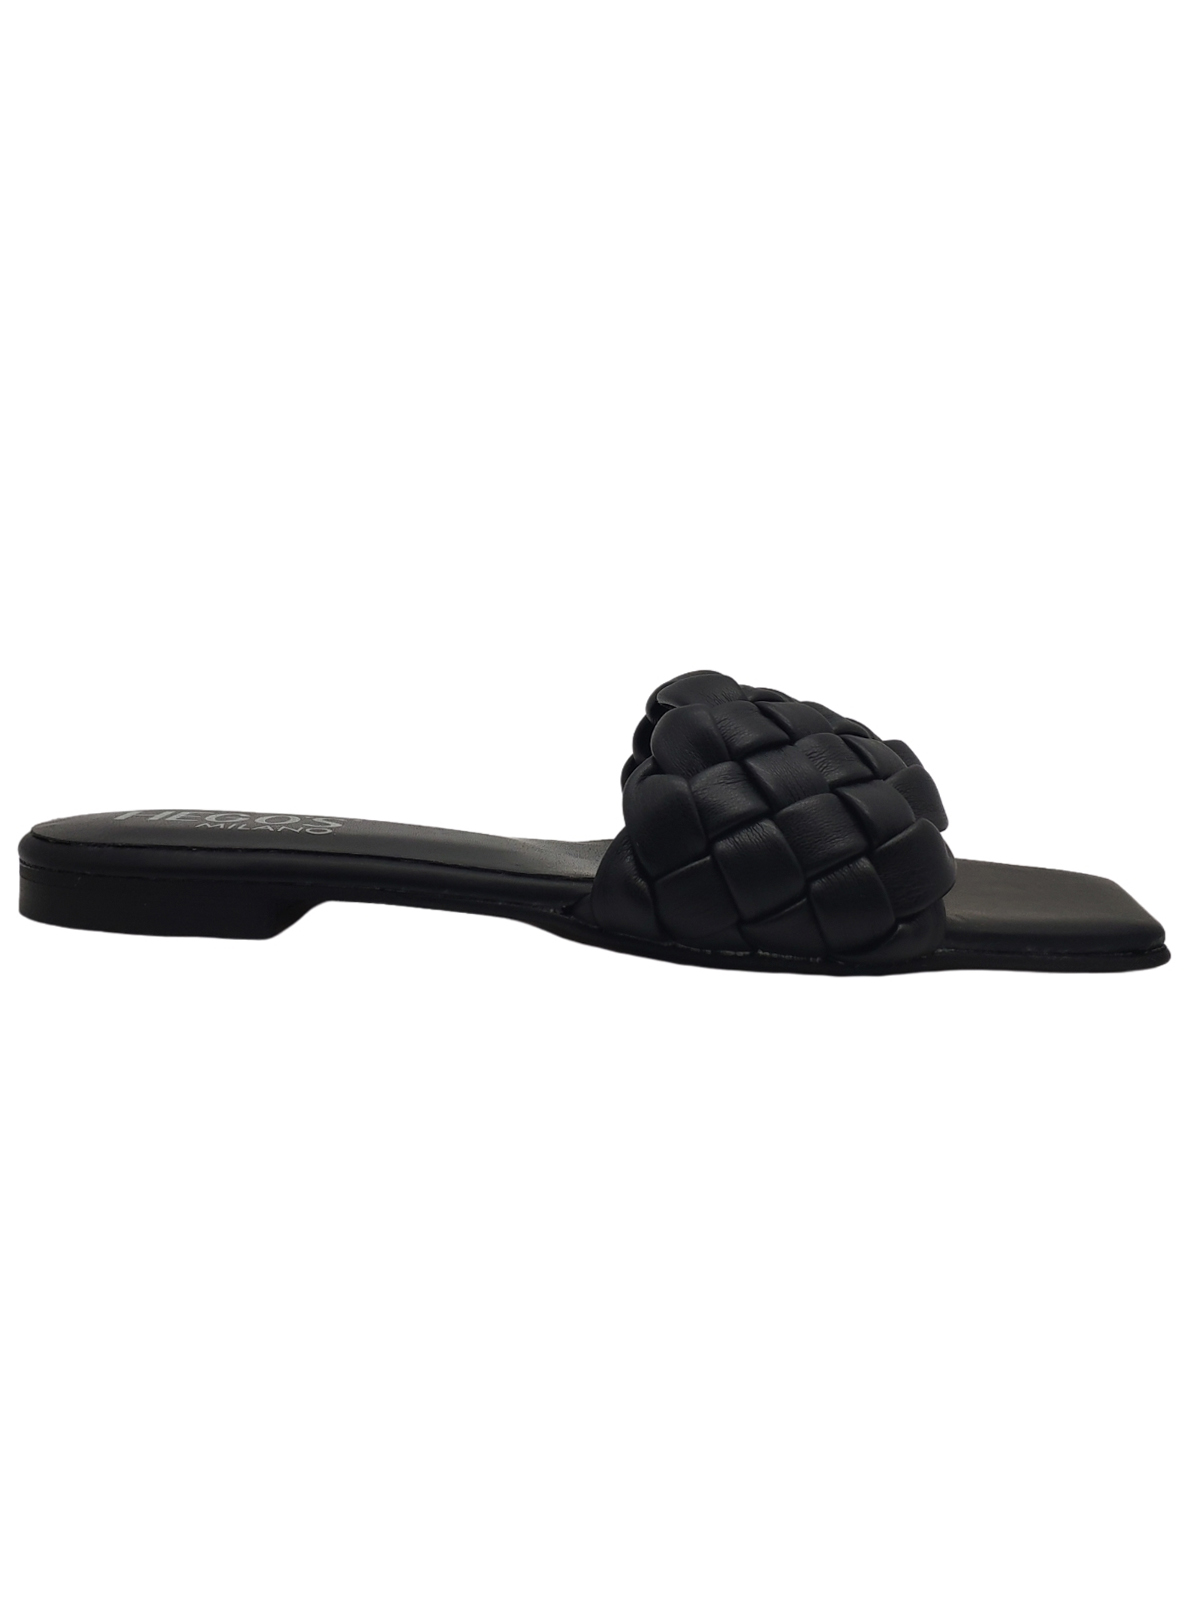 Flat Braided Sandals Woman Hegos | Flat sandals | 7131NERO